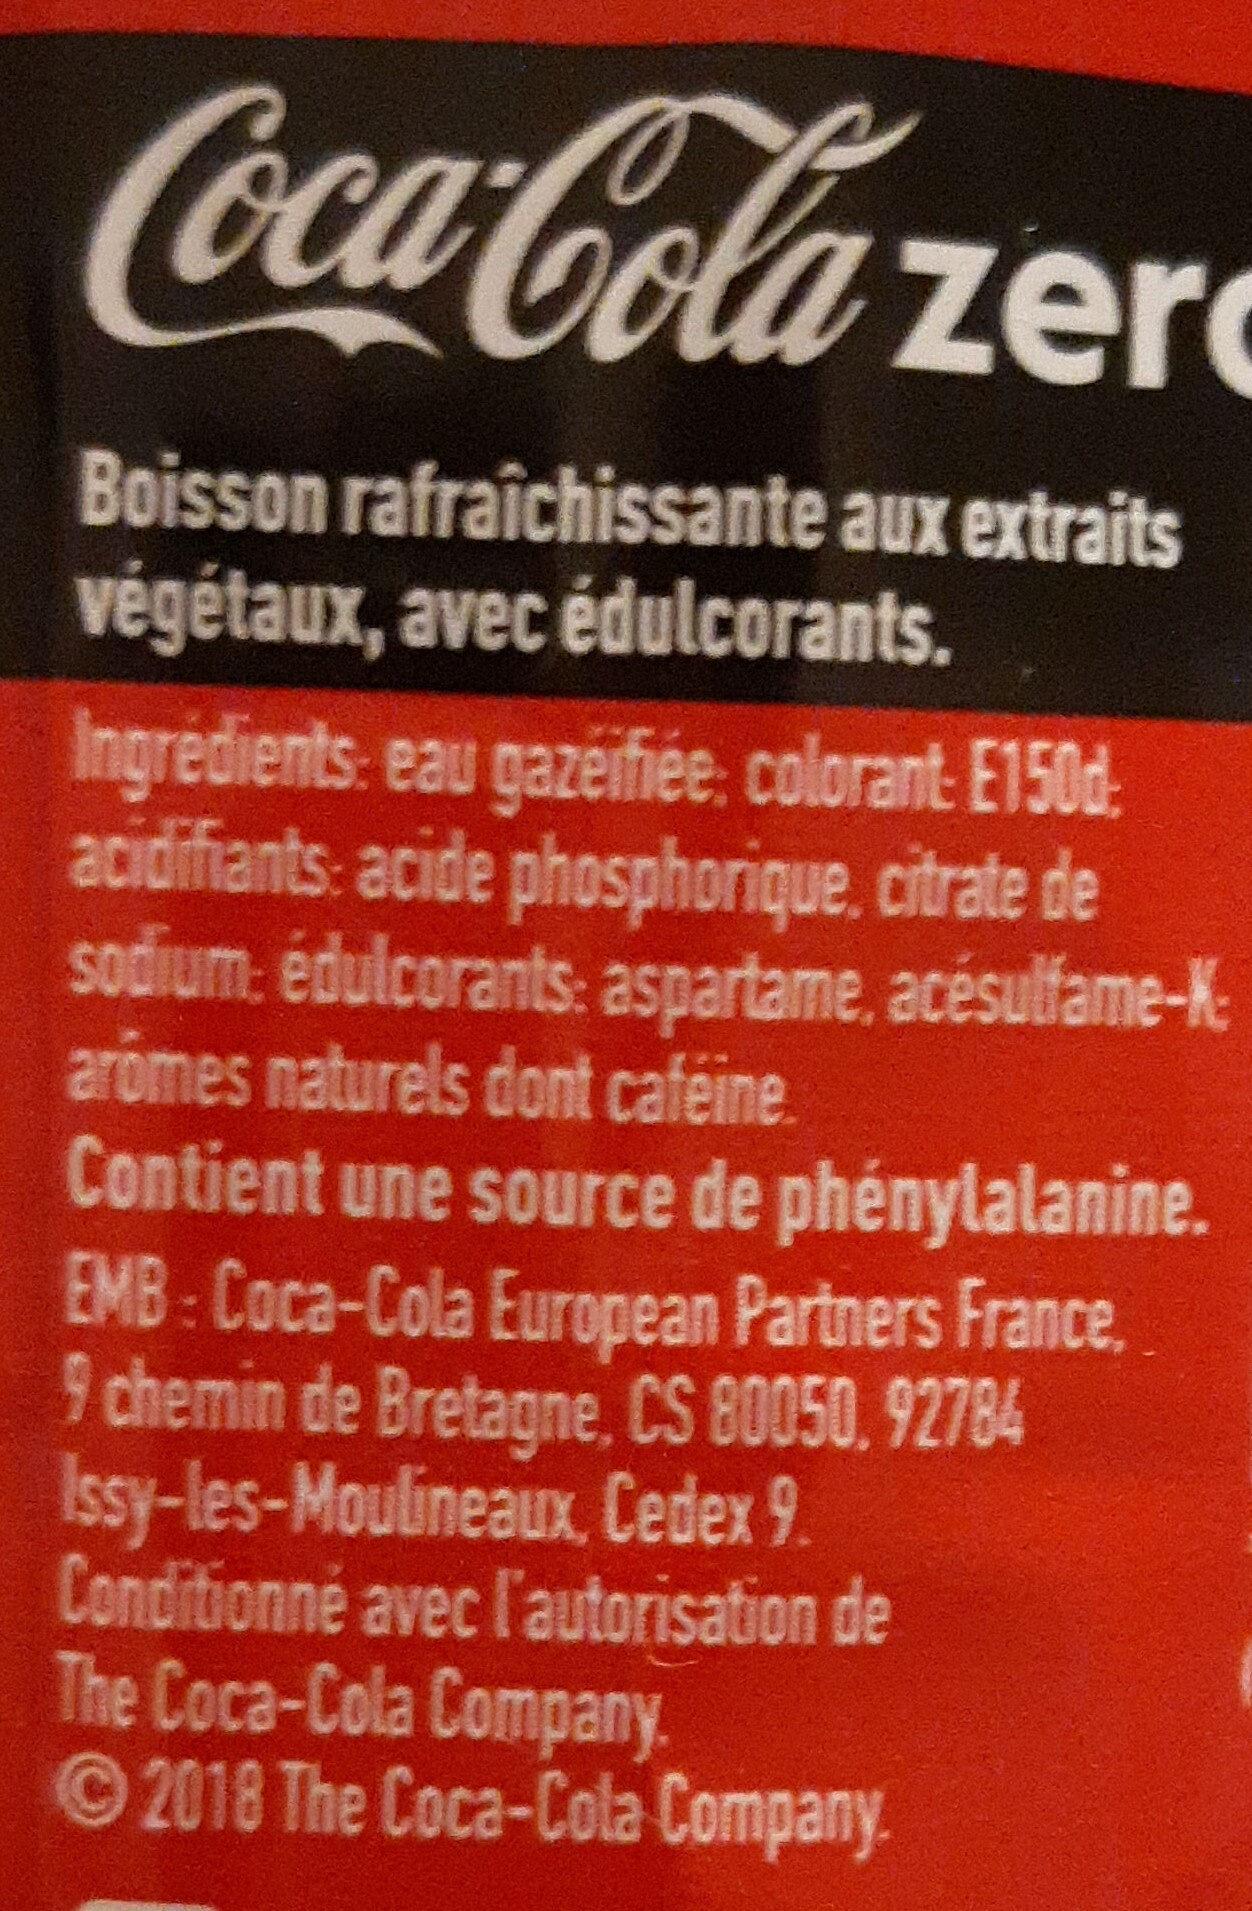 Coca-Cola zero® sans sucres - Ingredients - fr